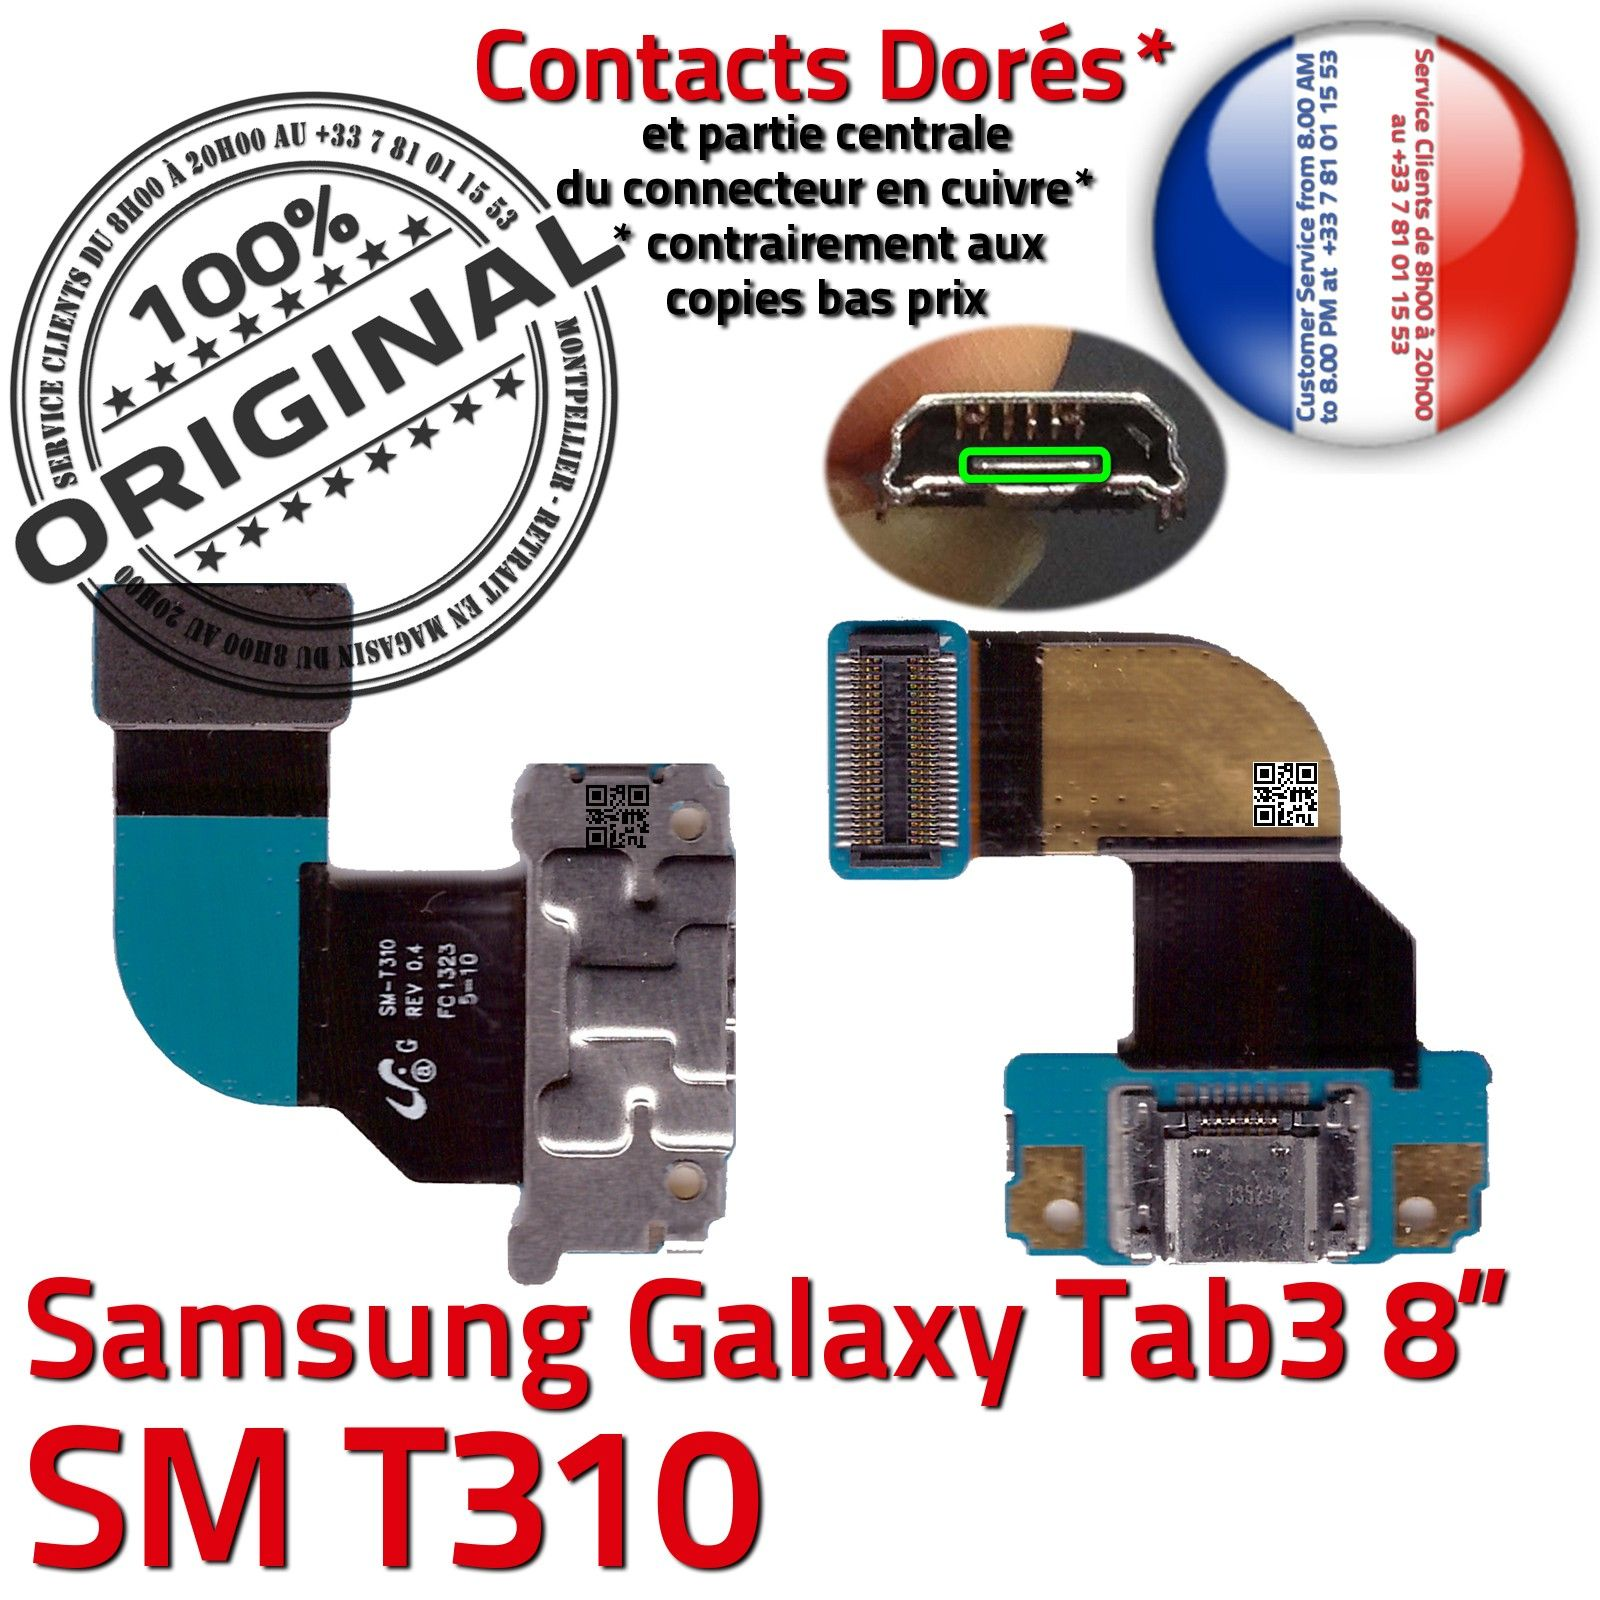 original samsung galaxy tab 3 t310 connecteur de charge microusb nappe chargeur ebay. Black Bedroom Furniture Sets. Home Design Ideas